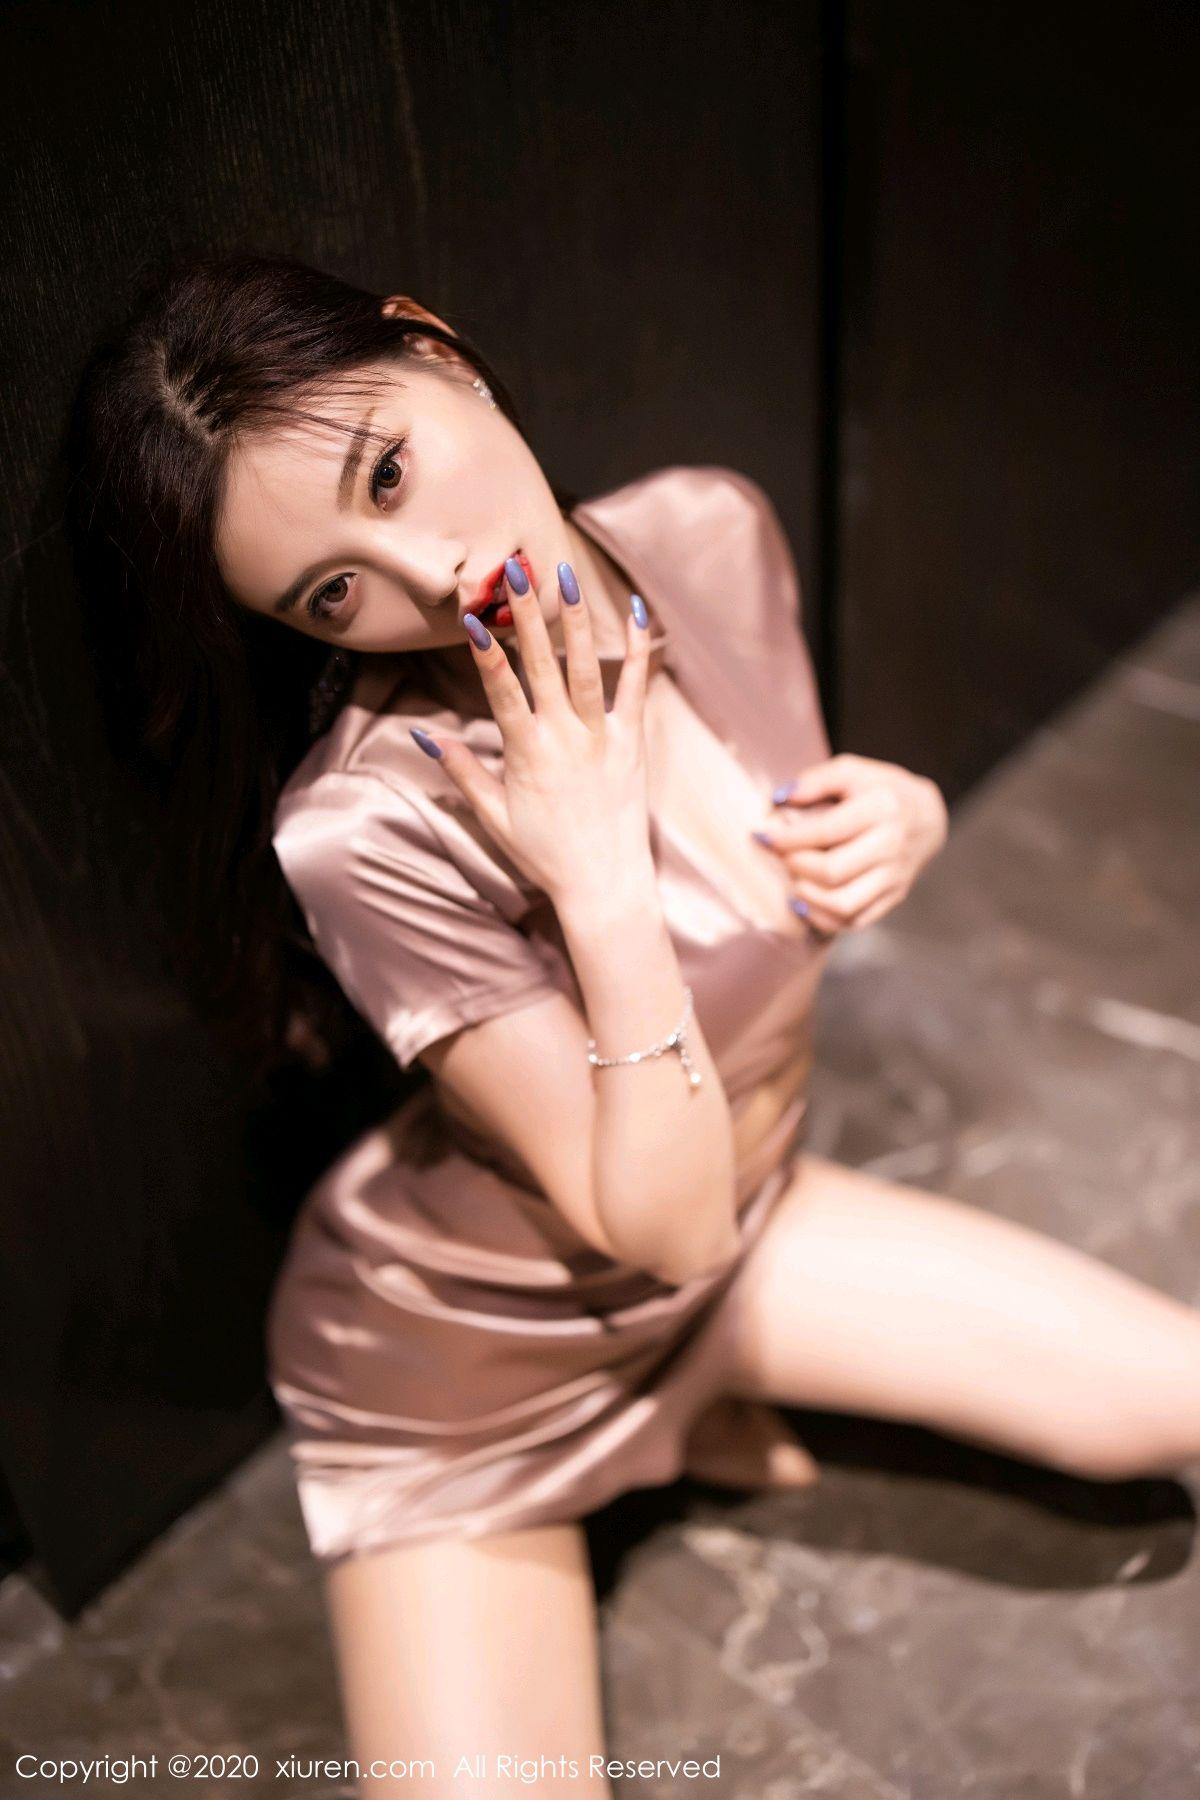 [XiuRen] Vol.2587 Yang Chen Chen 36P, Underwear, Xiuren, Yang Chen Chen